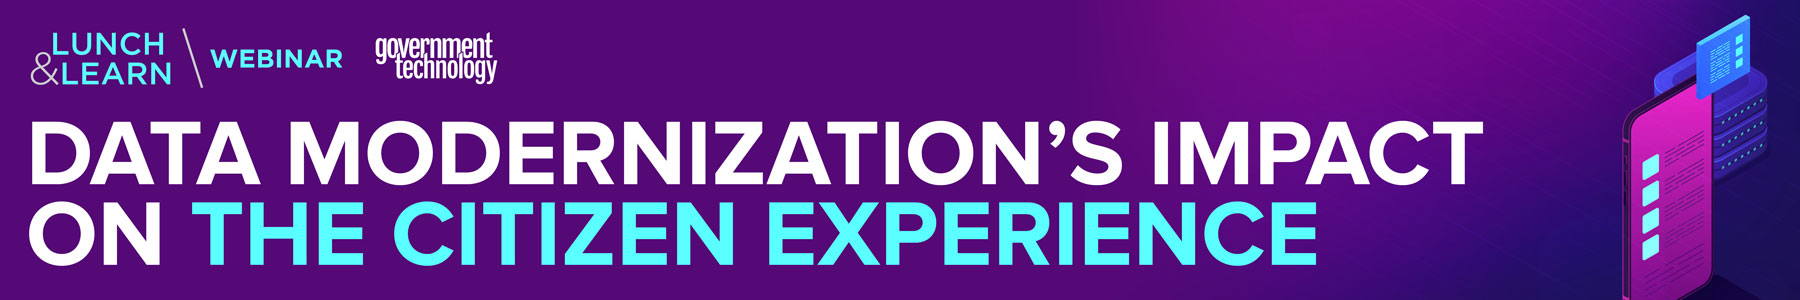 Data Modernization's Impact on the Citizen Experience